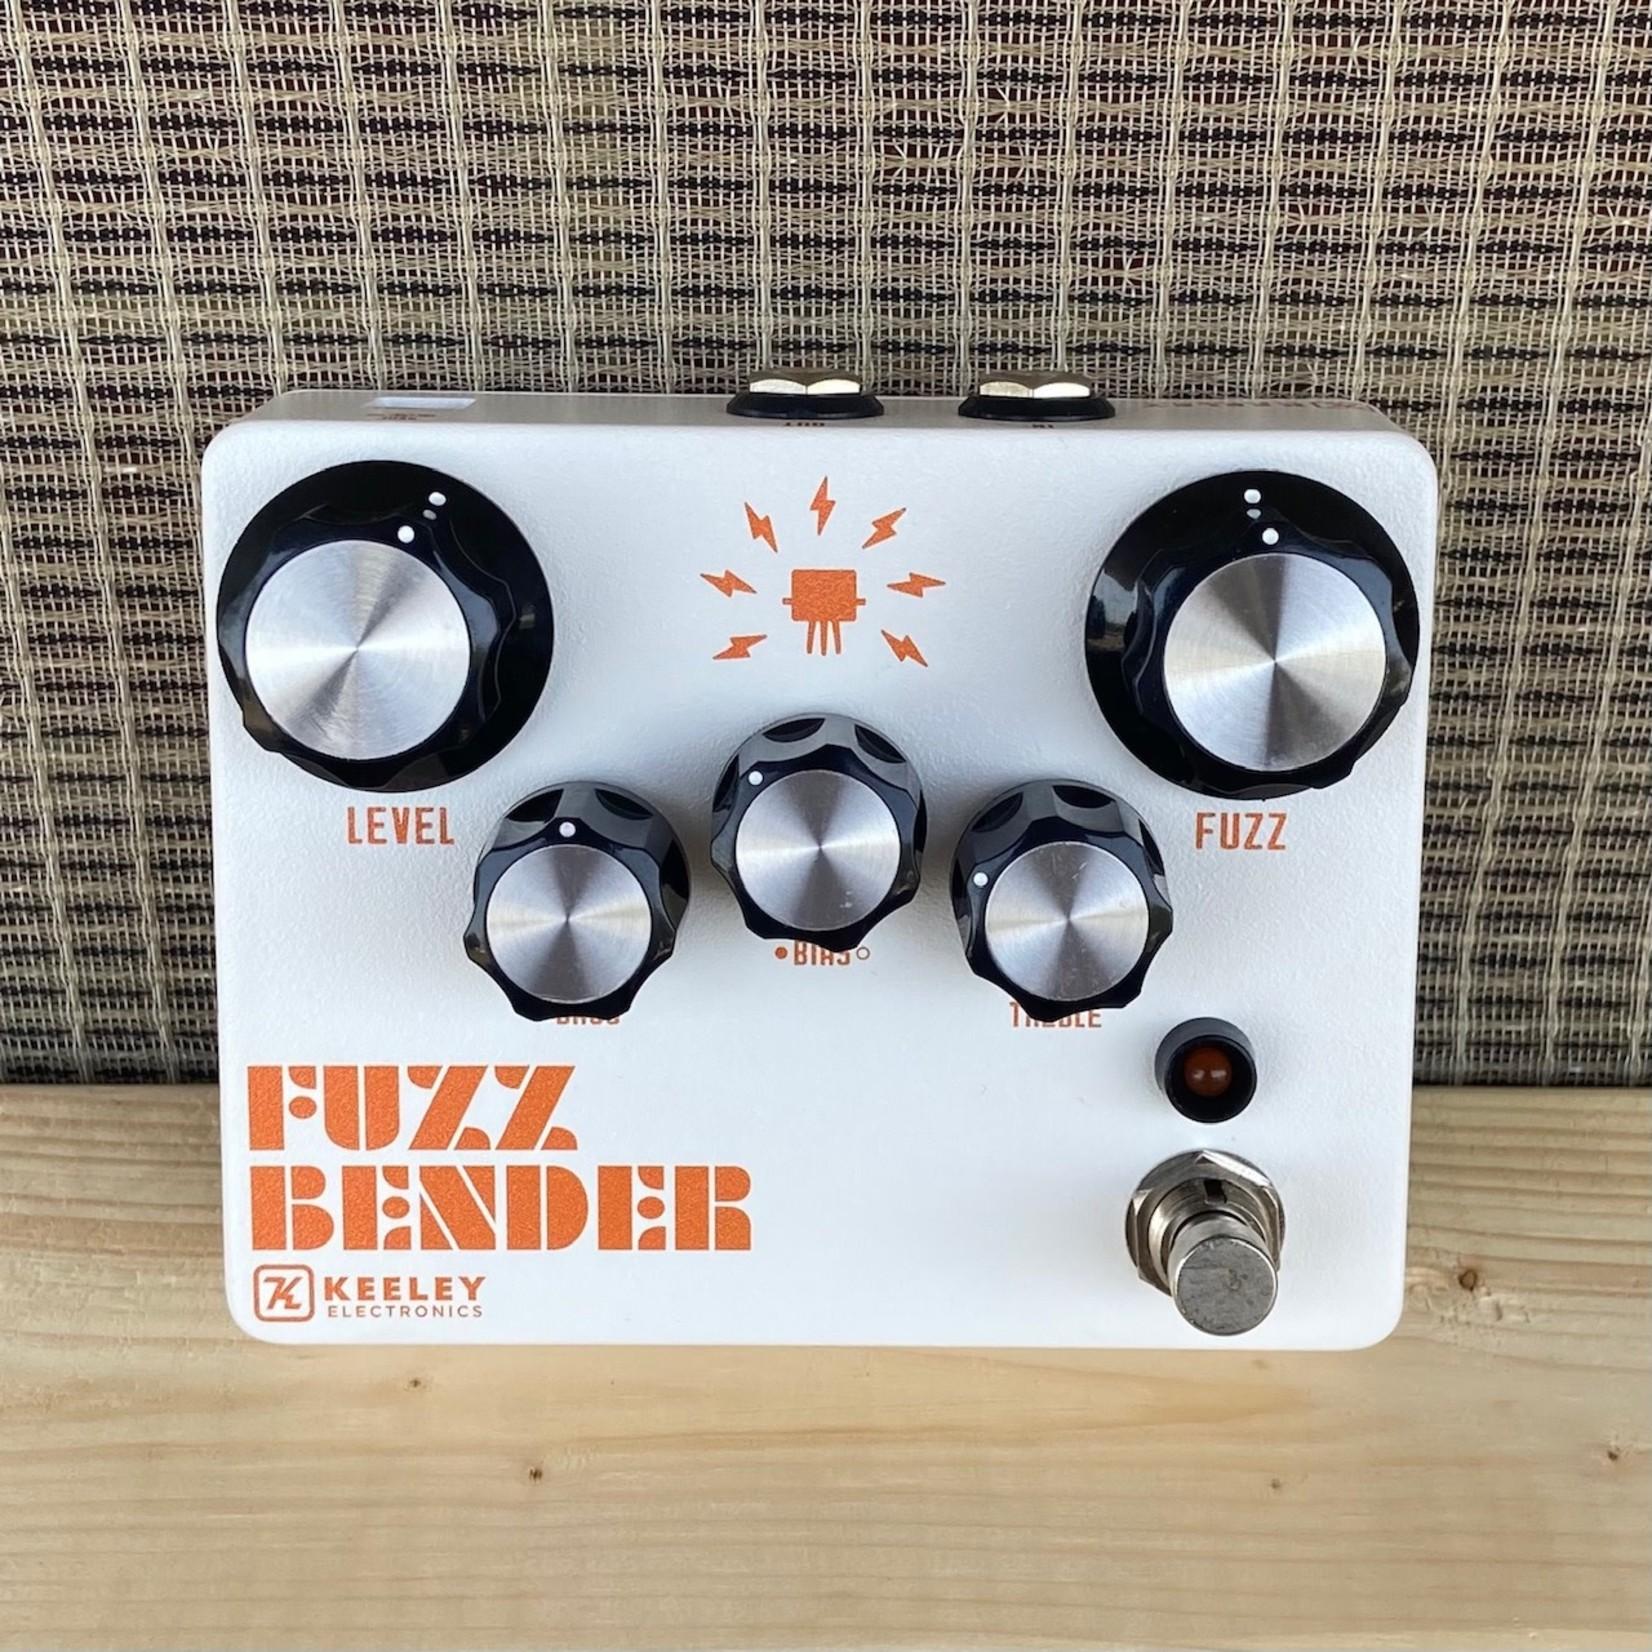 Keeley Electronics Keeley Fuzz Bender